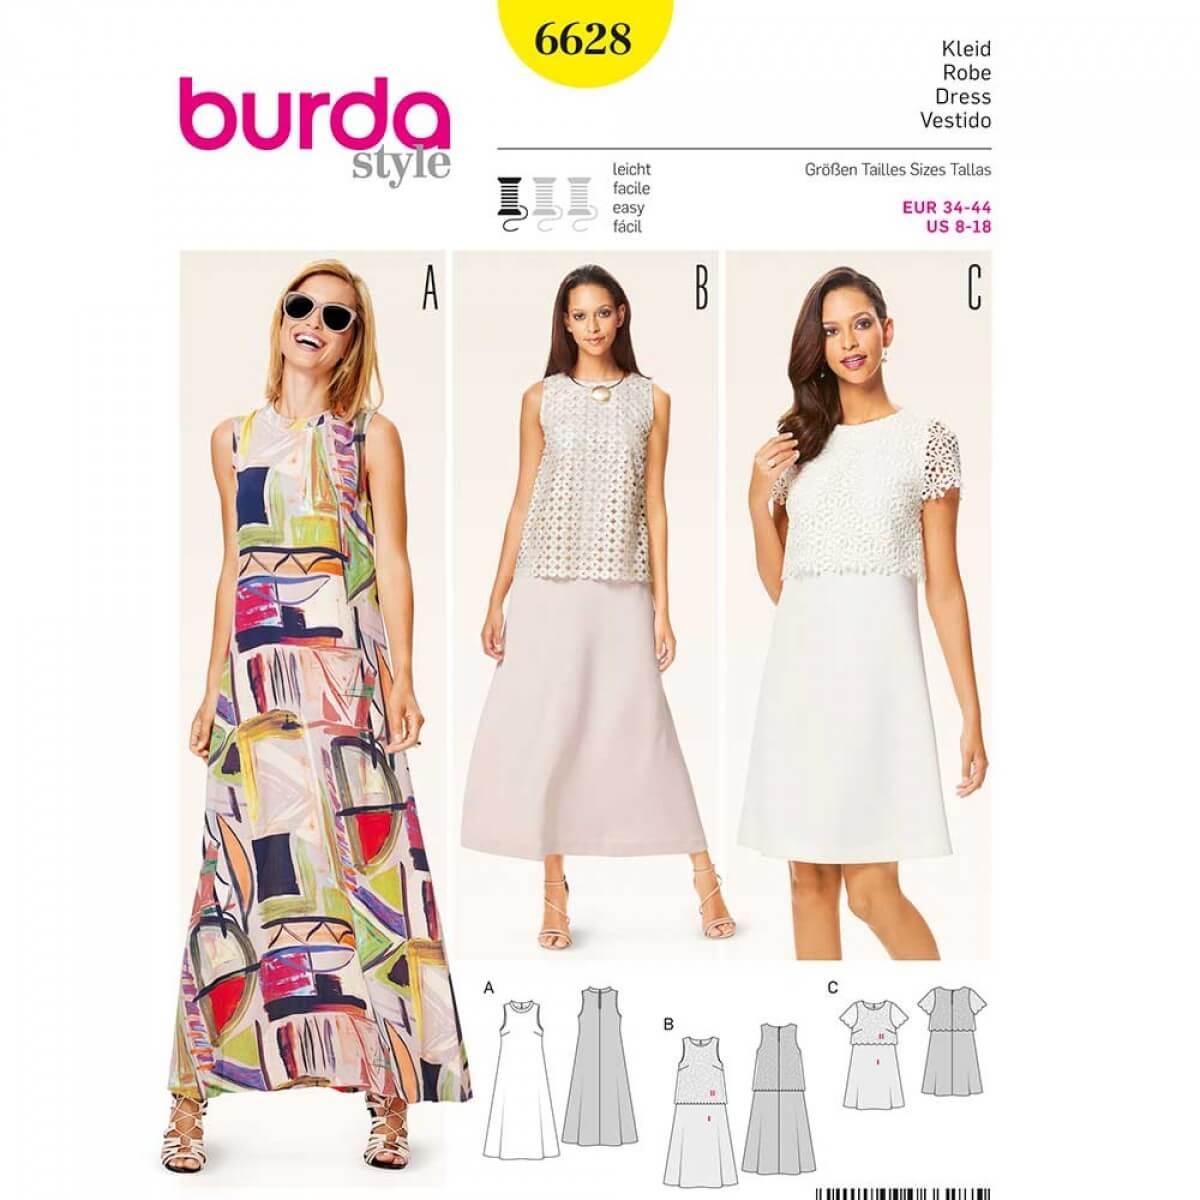 6a255017de356 Patron de robe femme, Burda 6628 - Cousu Main saison 3 - Mercerie ...